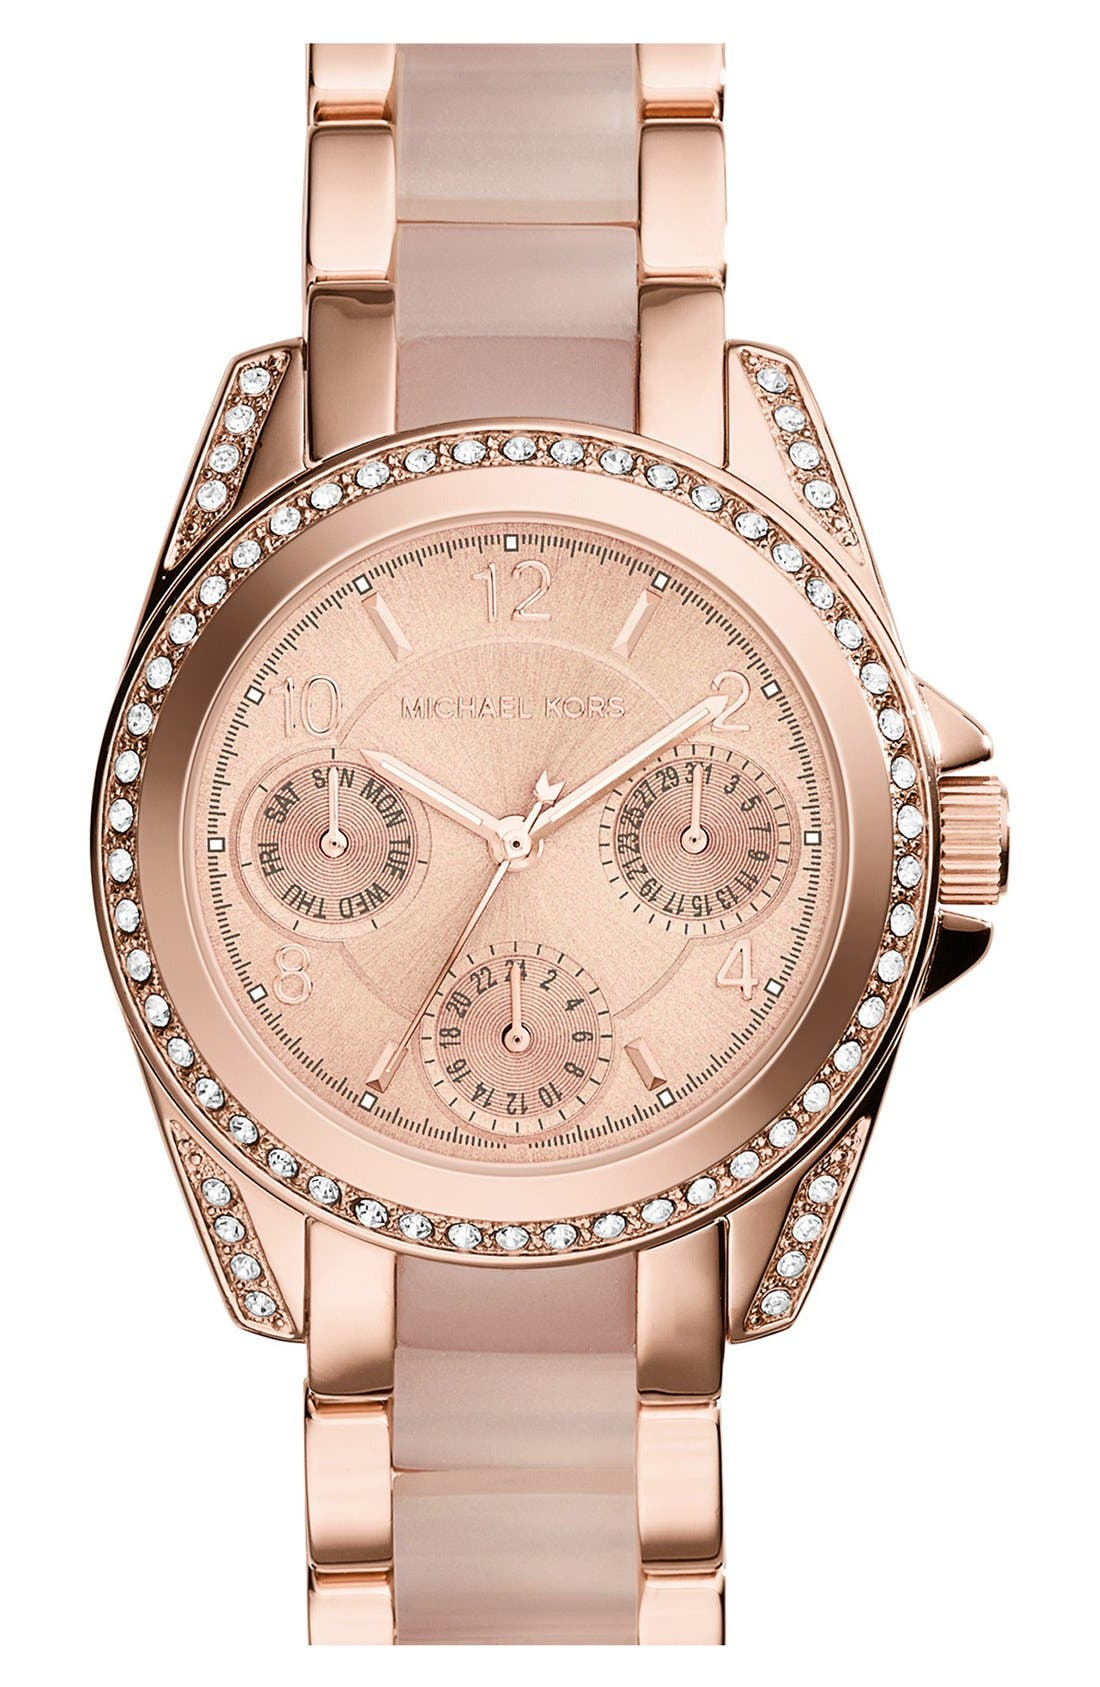 Main Image - Michael Kors'MiniBlair' Multifunction Bracelet Watch, 33mm